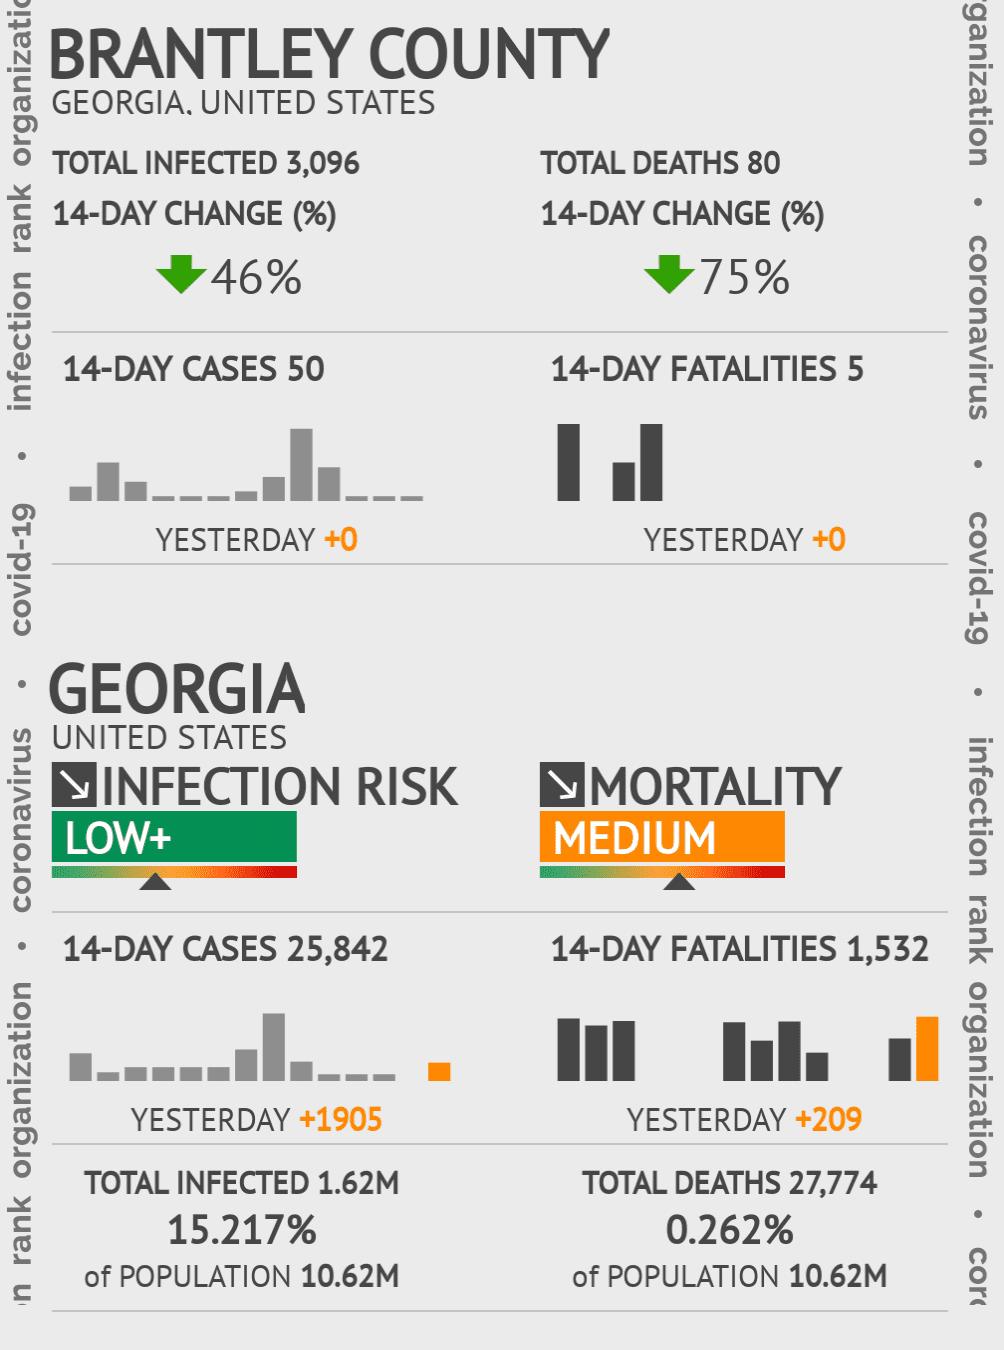 Brantley County Coronavirus Covid-19 Risk of Infection on November 29, 2020